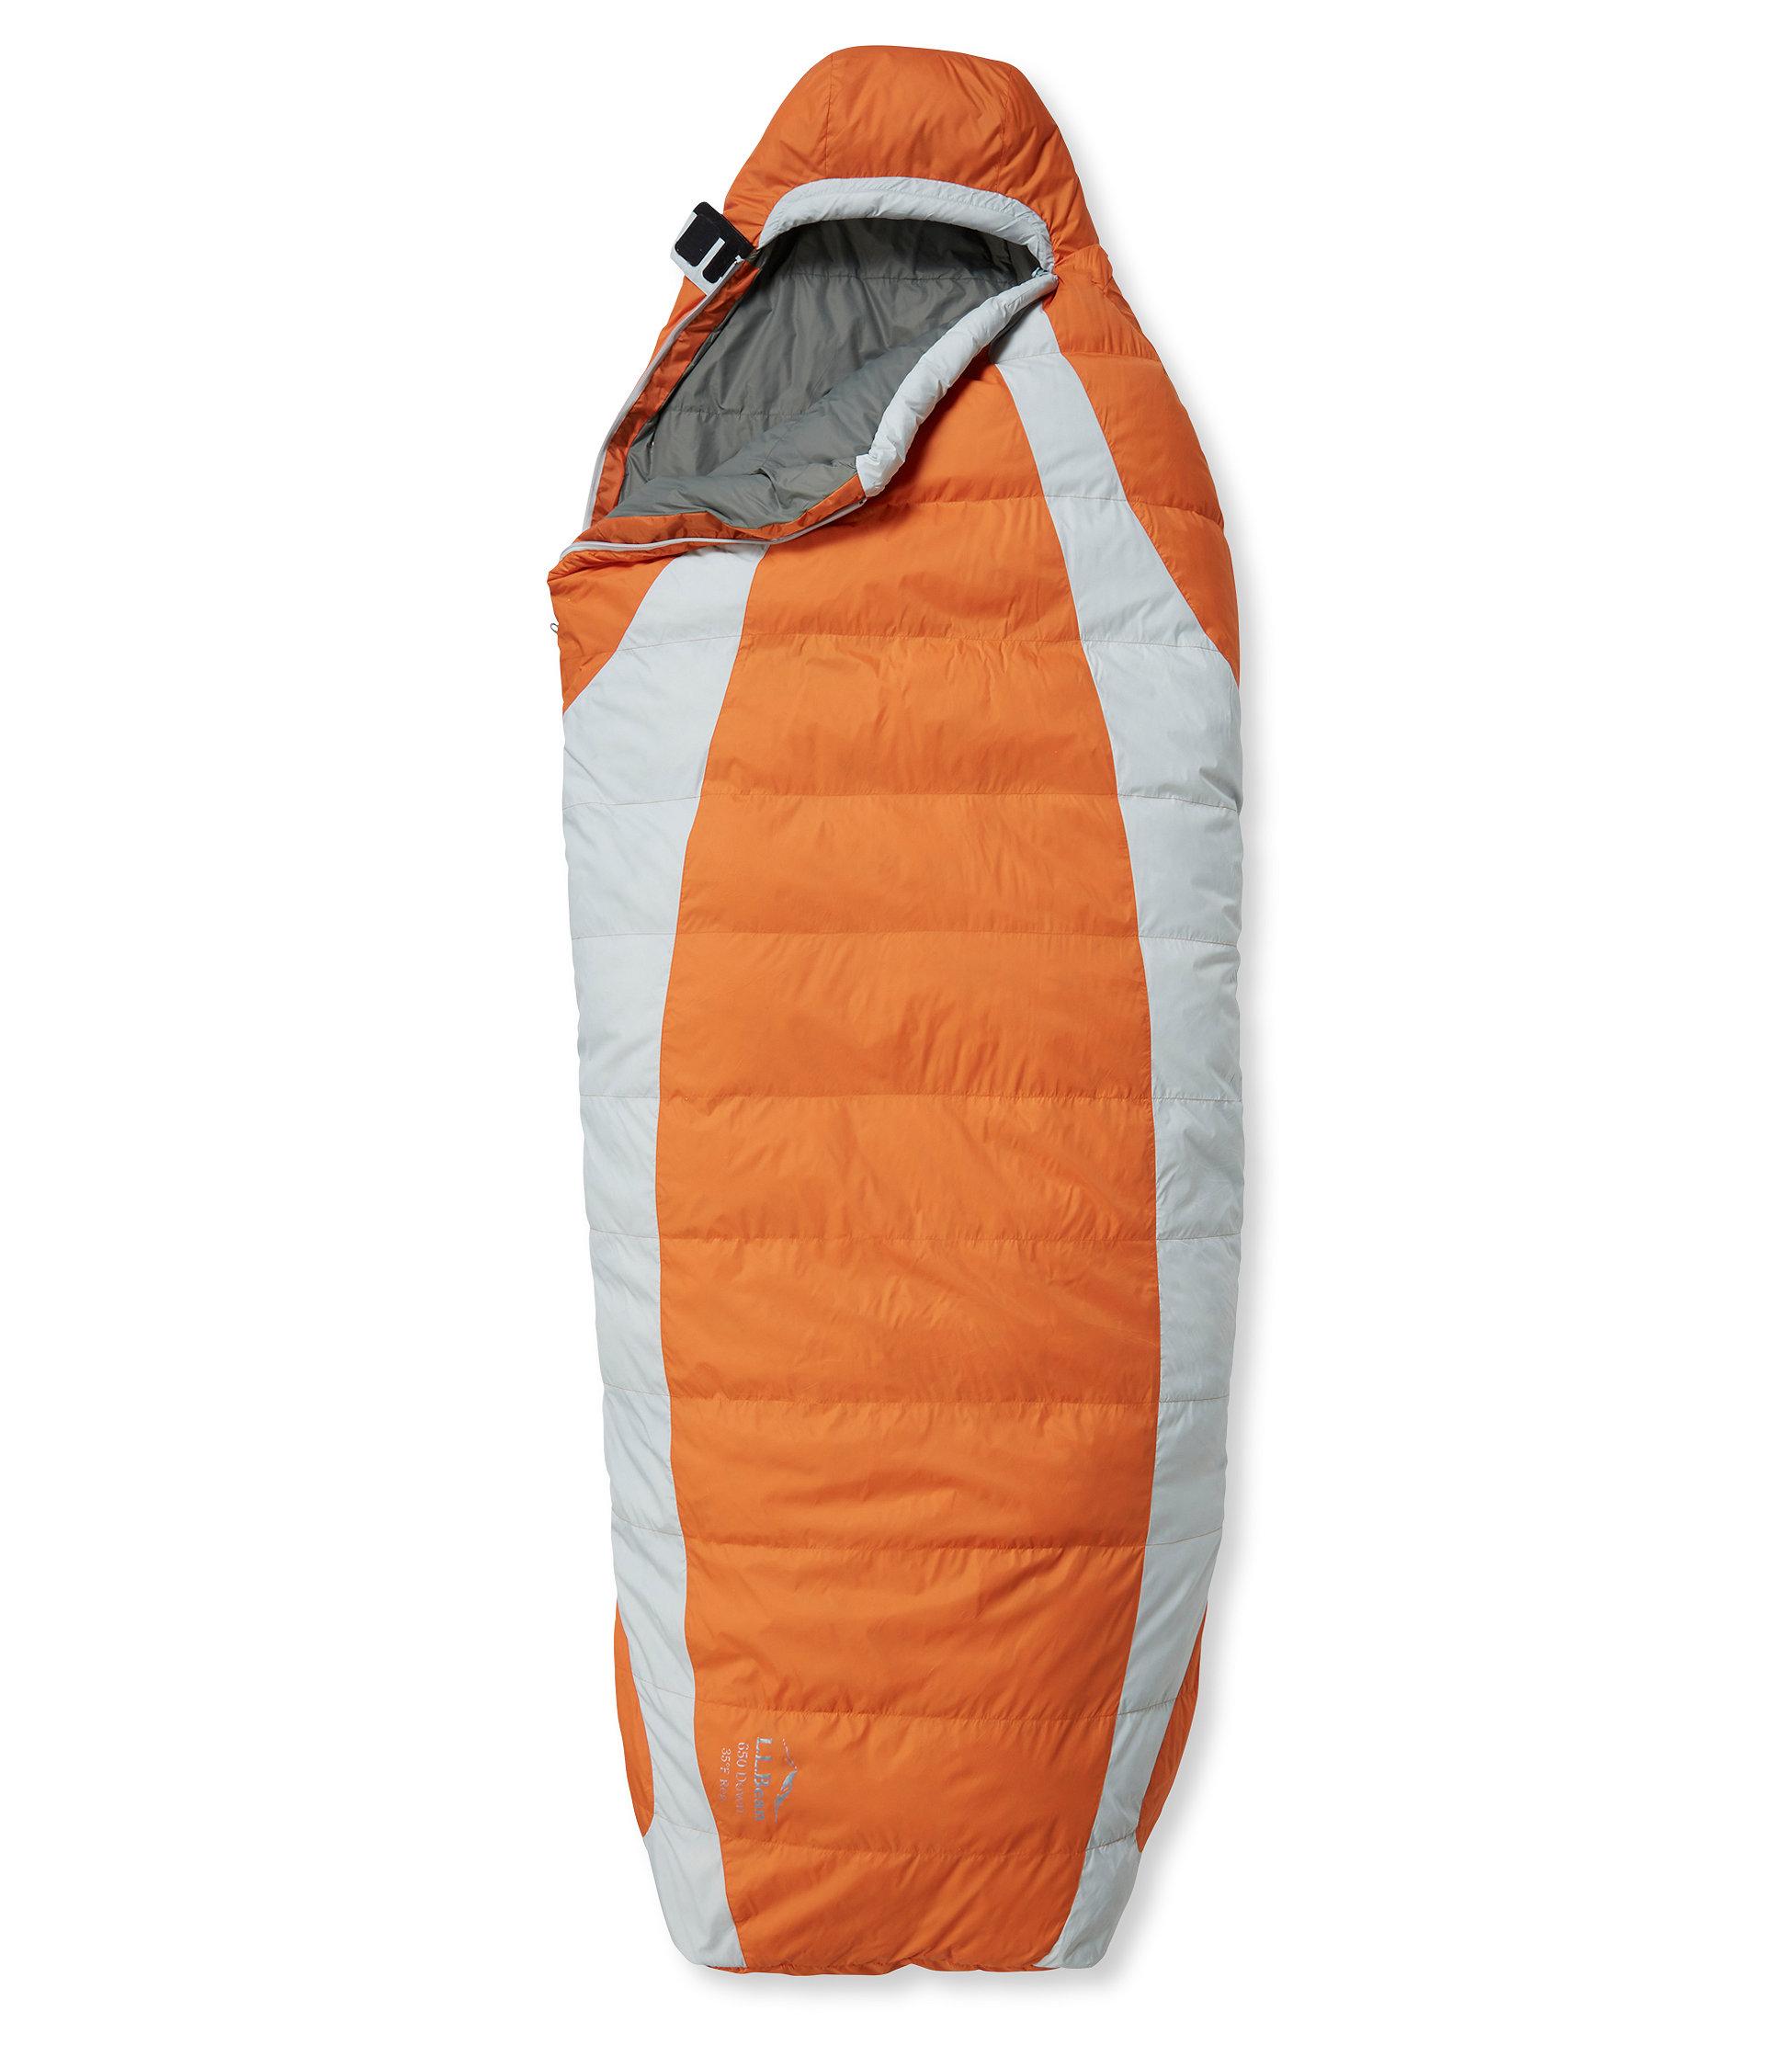 photo: L.L.Bean Down Sleeping Bag with DownTek, Semi-Rectangular 35° warm weather down sleeping bag